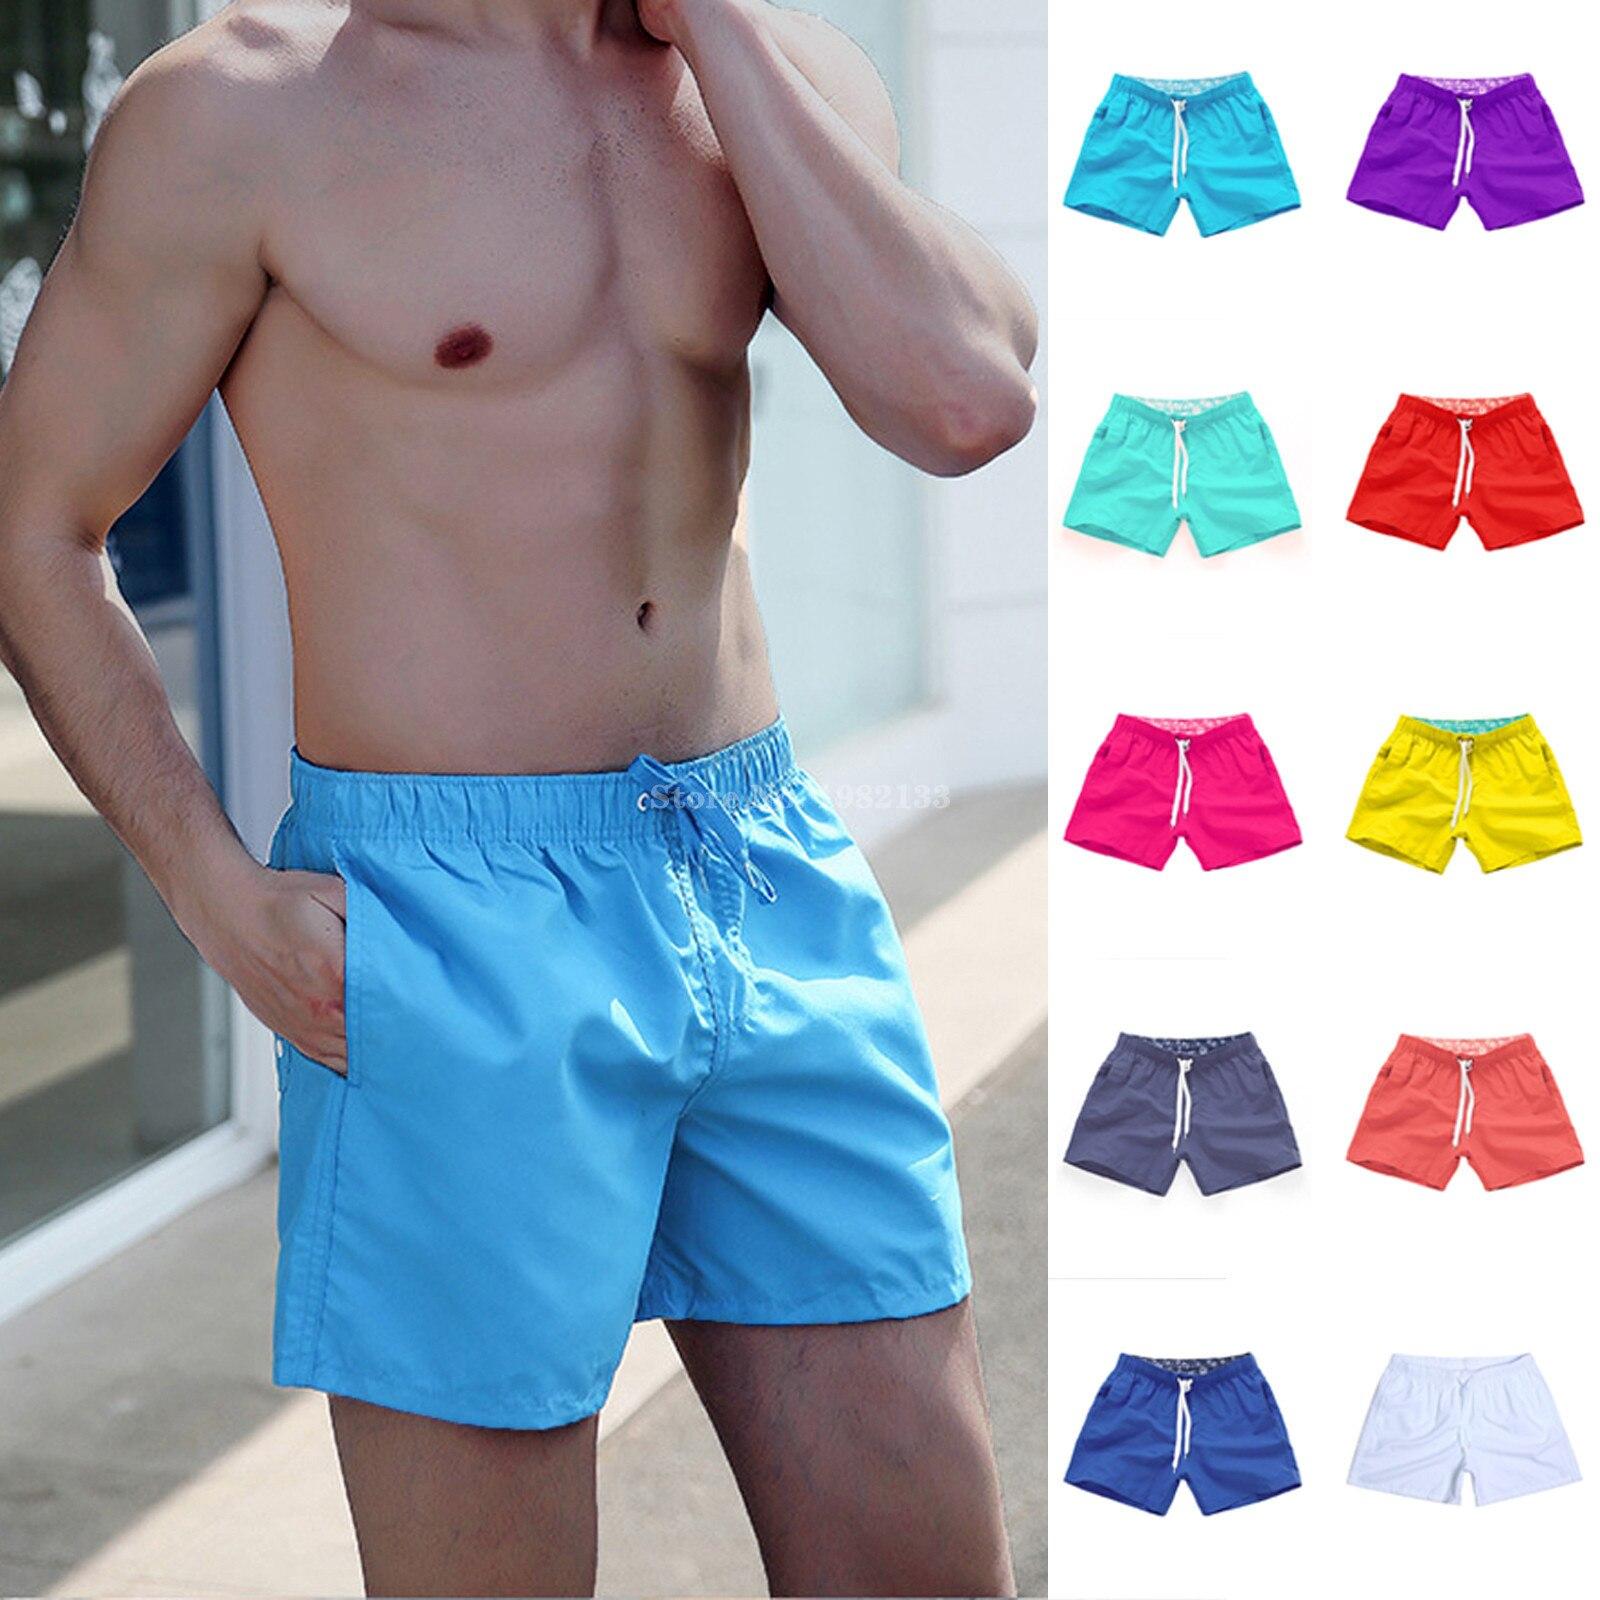 Swimming trunks men Summer Breeches board shorts Casual Bermudas Black White Boardshorts Homme Classic Clothing Beach Short Male 1